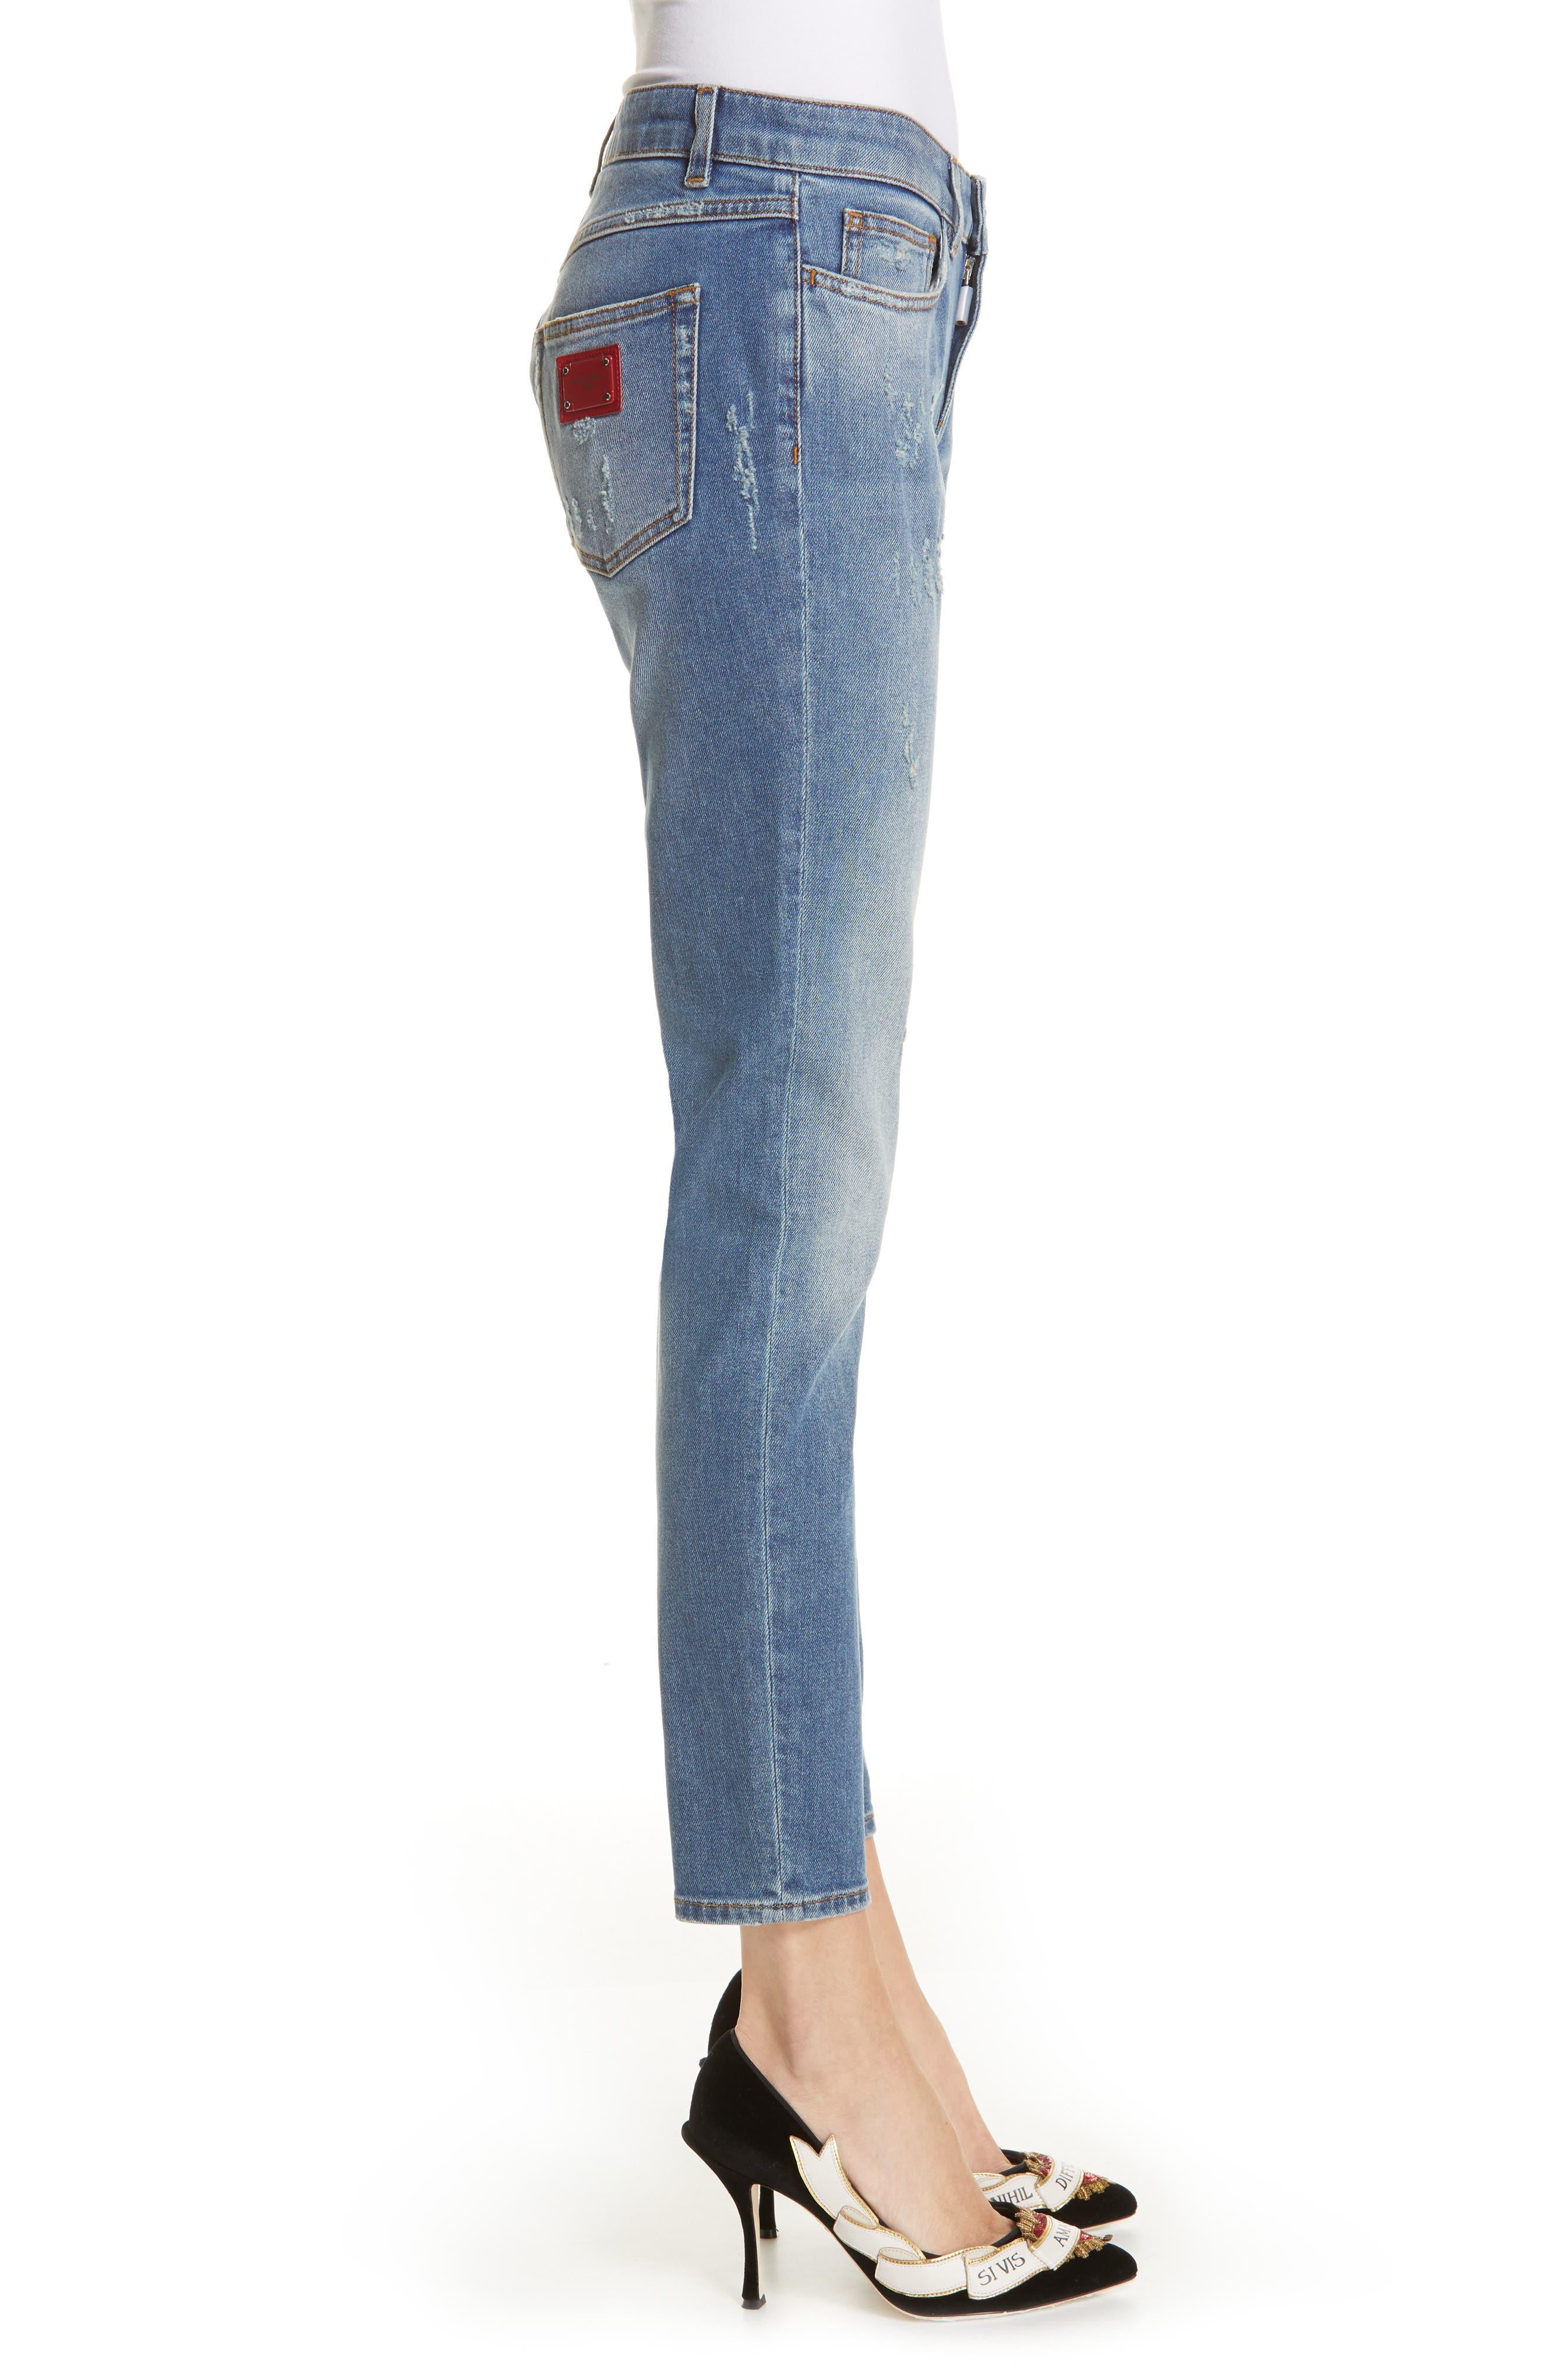 DOLCE&GABBANA, Logo Plaque Skinny Jeans, Alternate thumbnail 3, color, MED BLUE